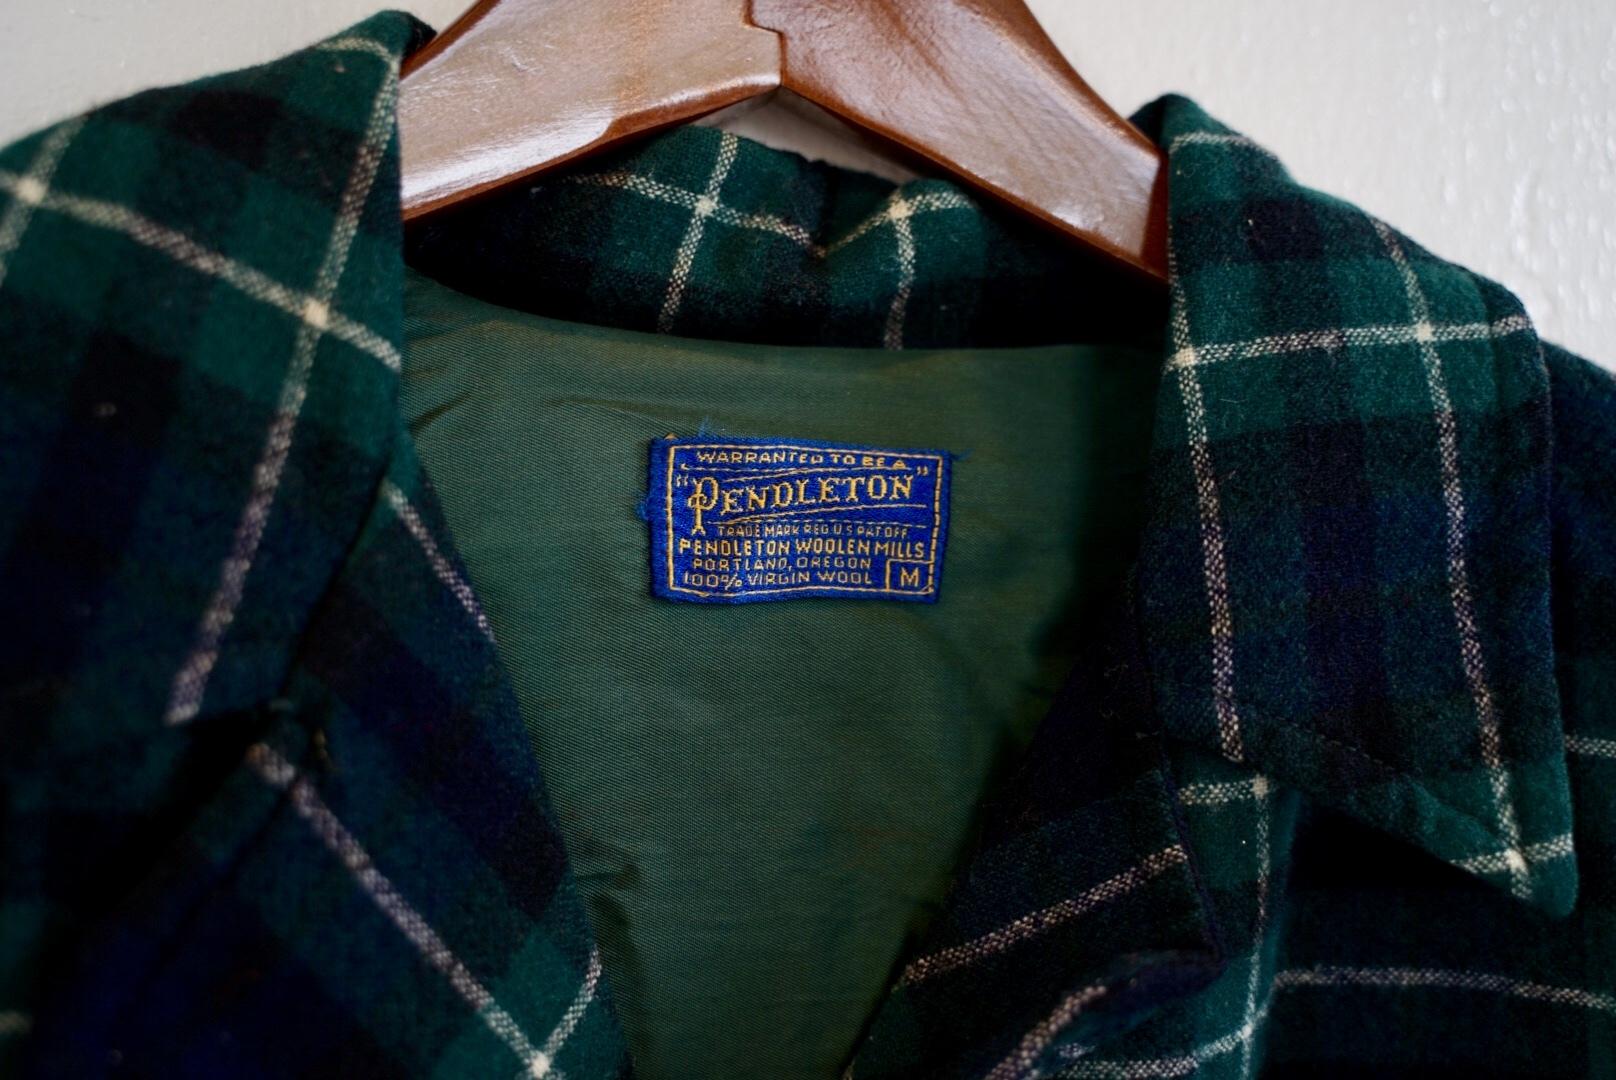 Pendleton ウールジャケット